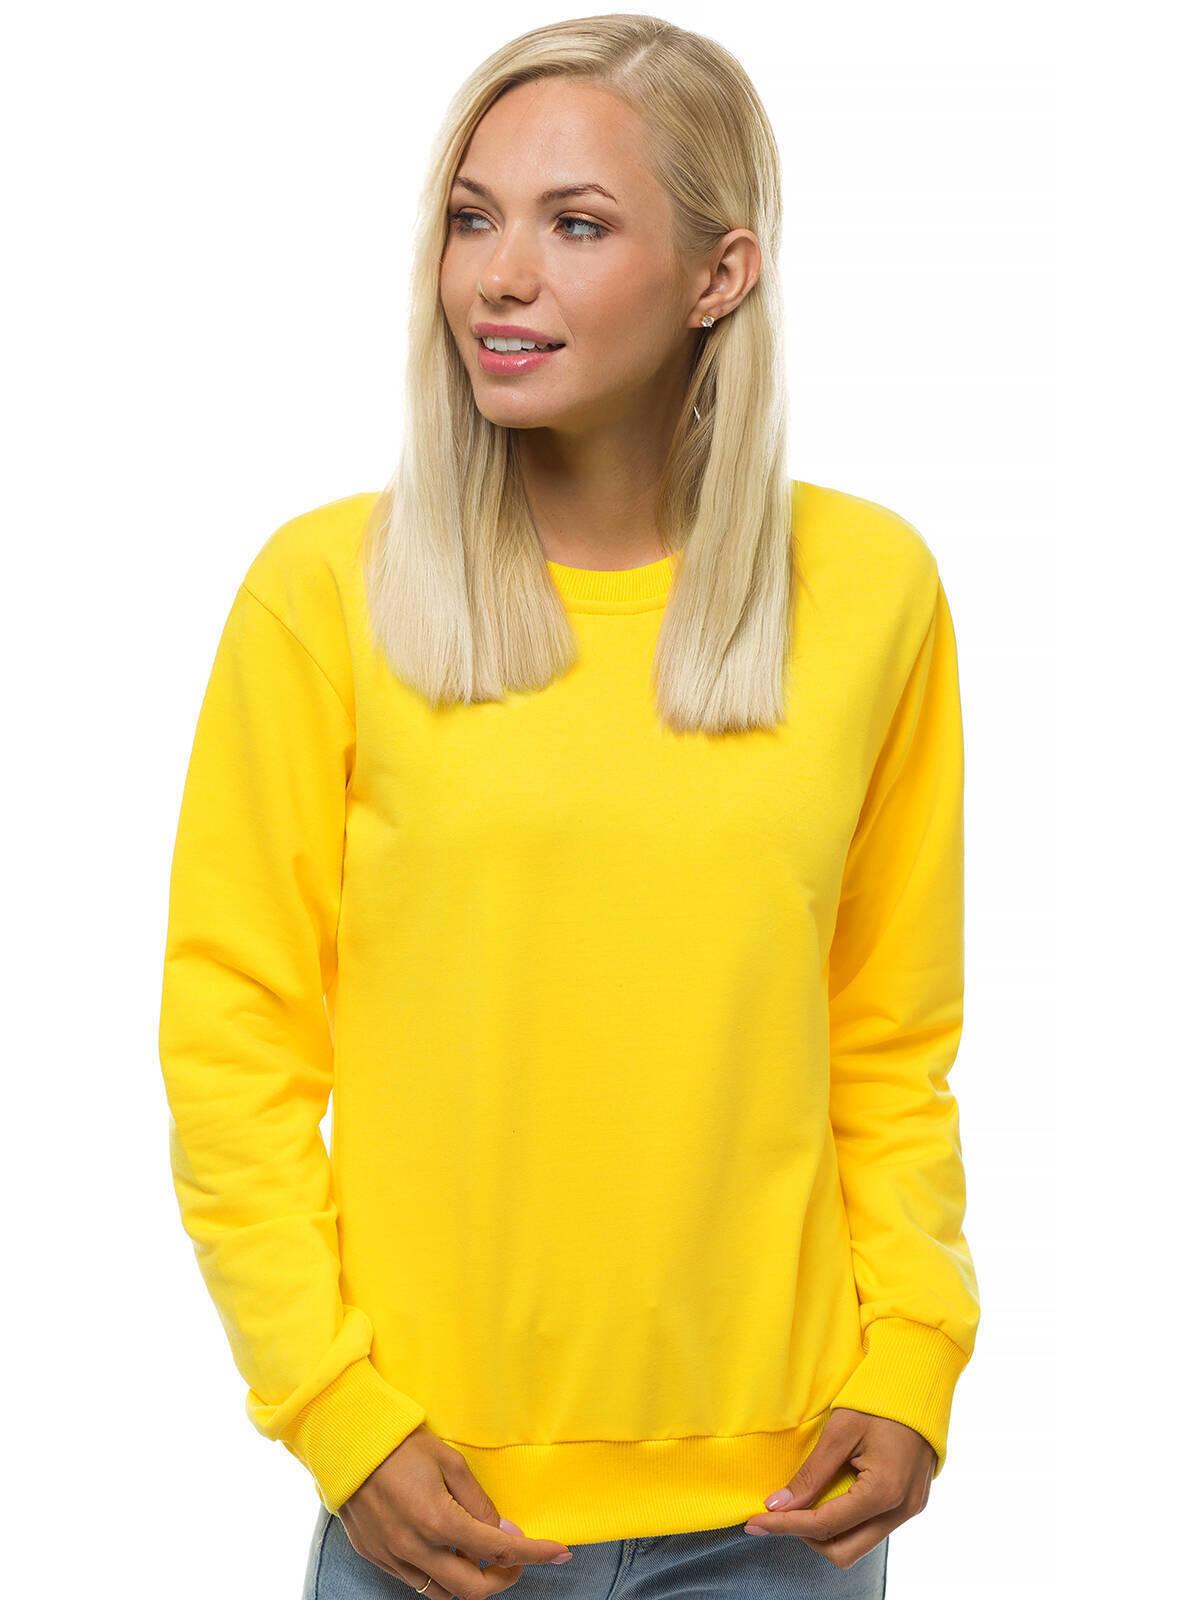 Sweatshirt Langarmshirt Pullover Pulli Rundhals Unifarben Sport OZONEE 002 Damen